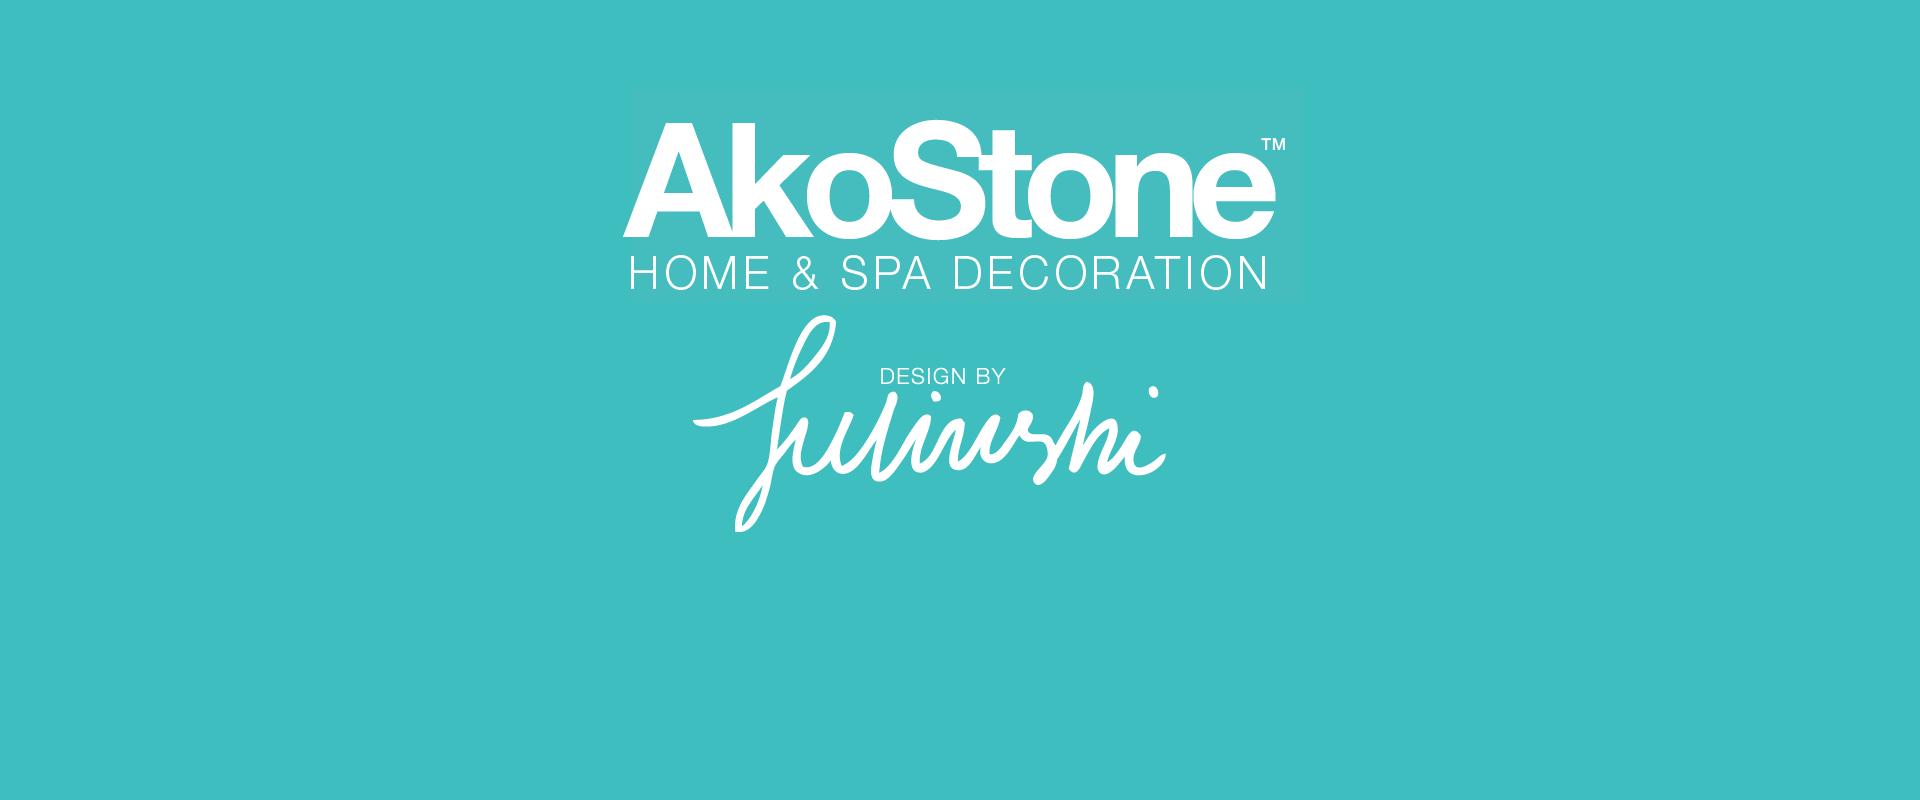 Akostone